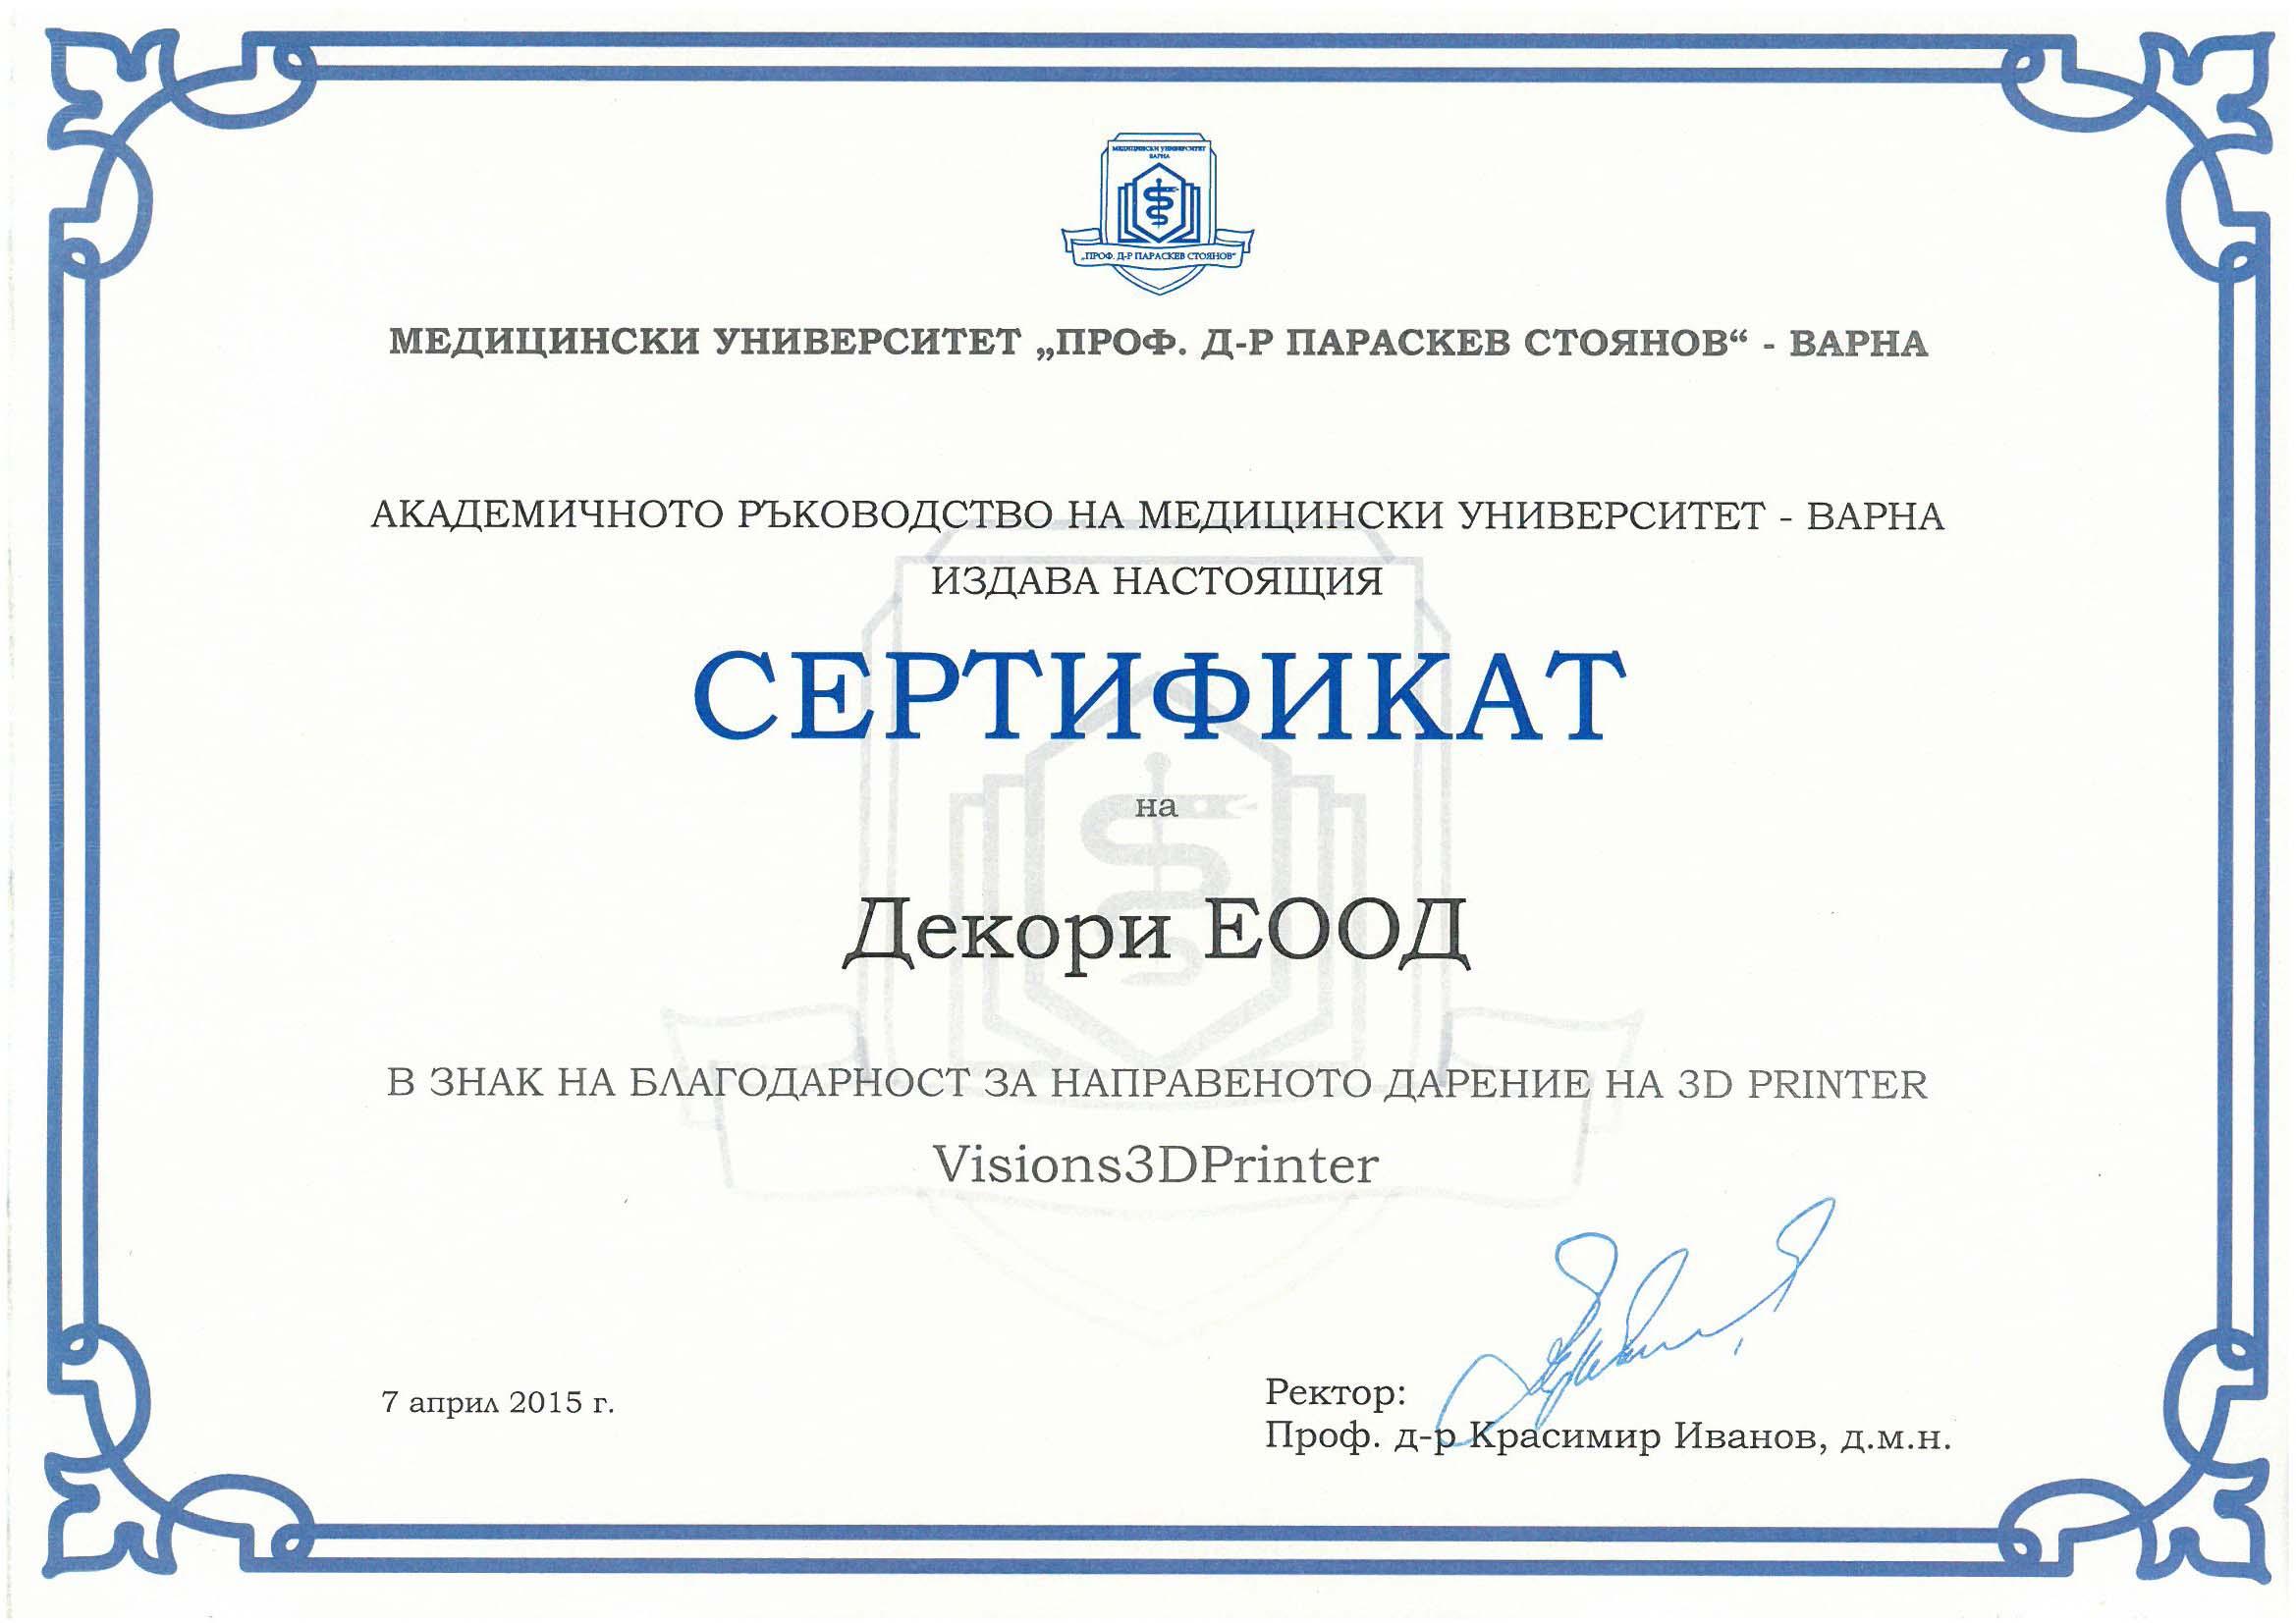 Сертификат Медицински университет - Варна